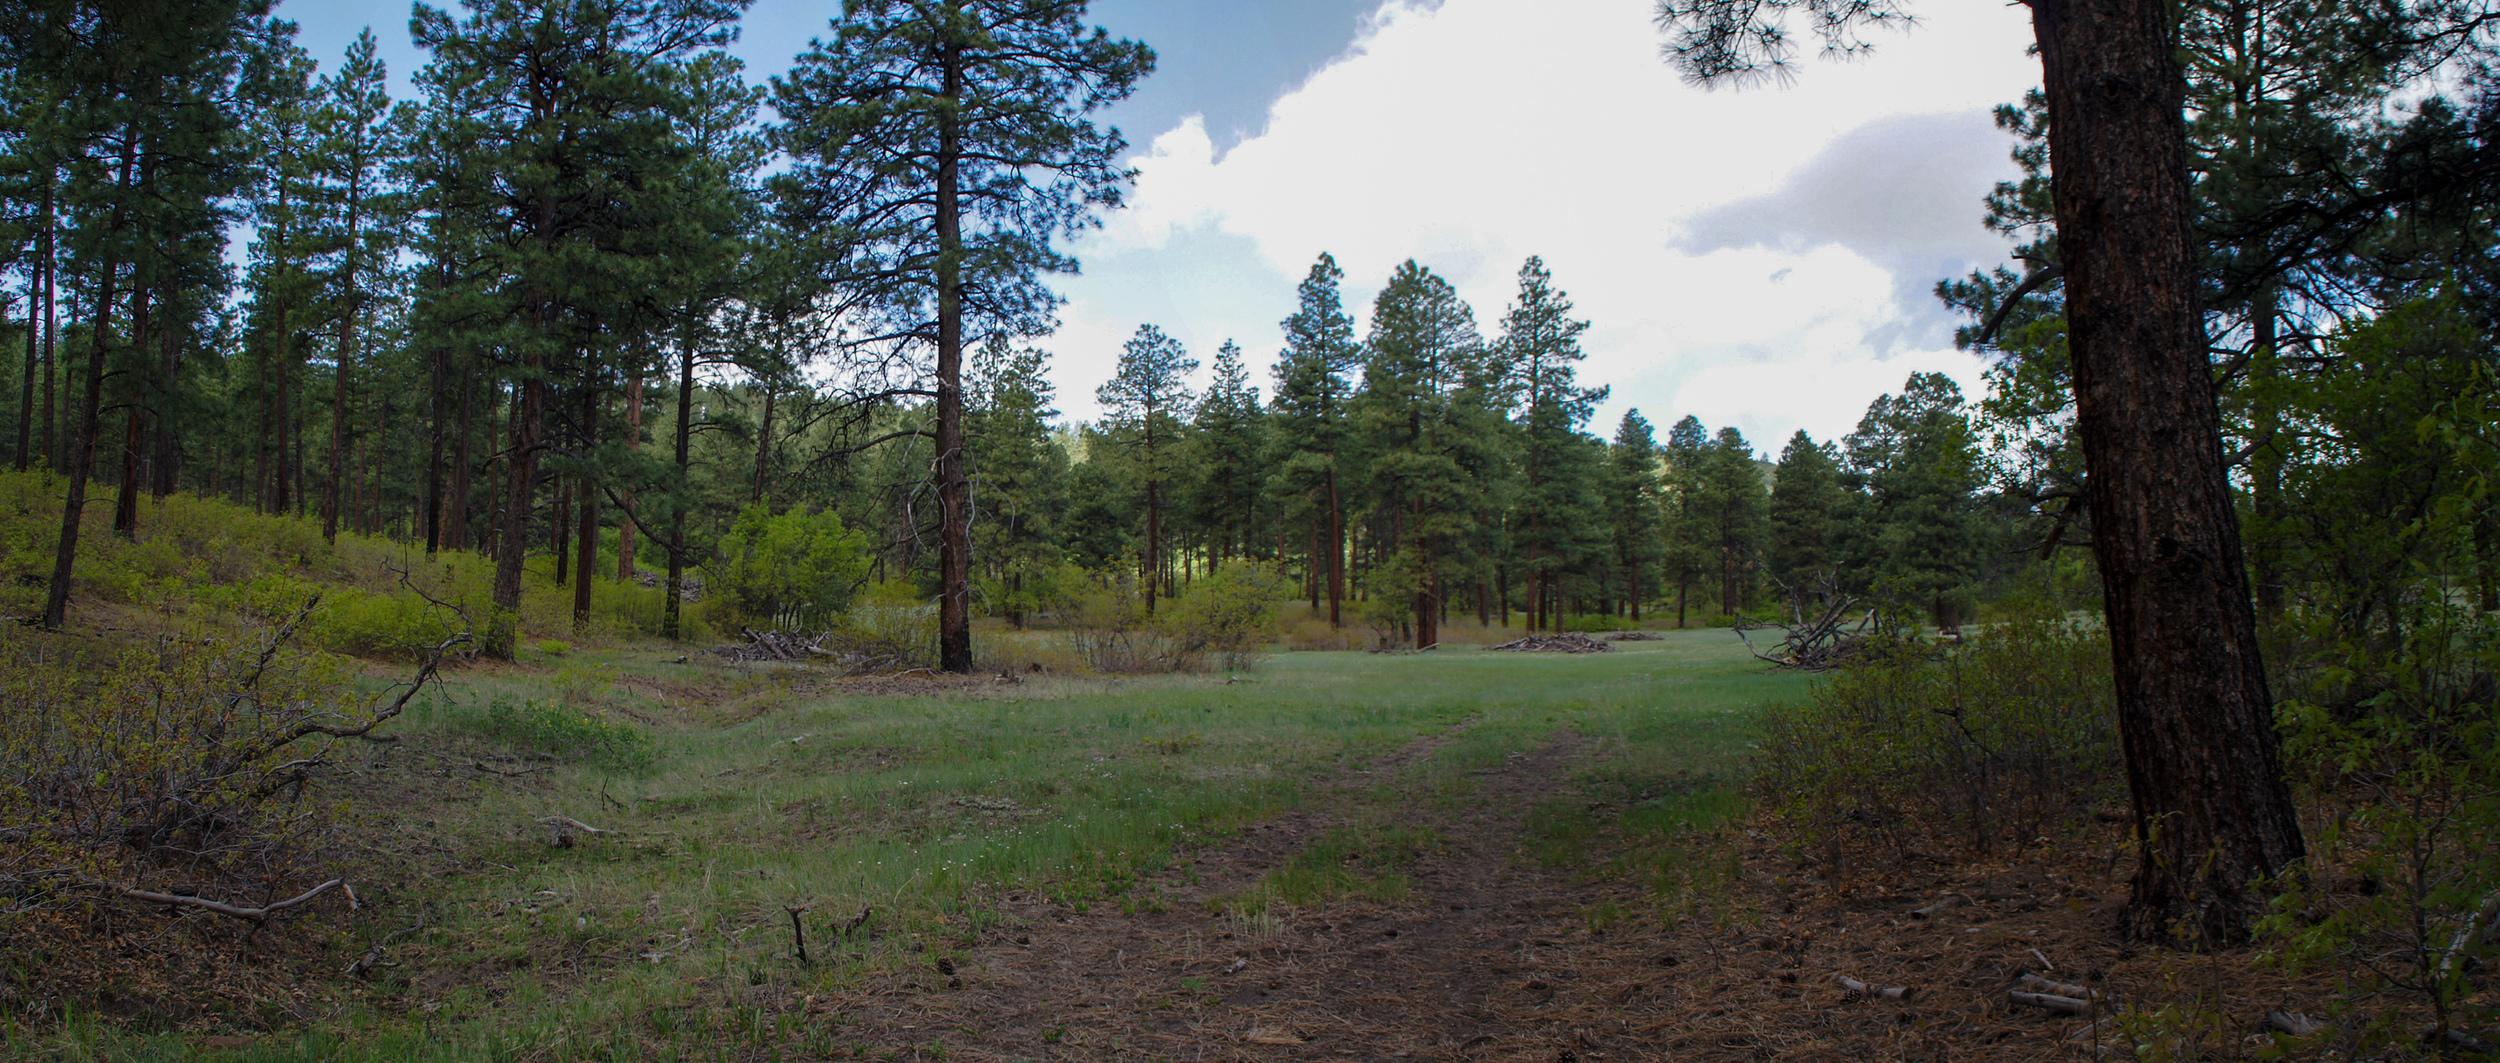 Pano - Eagles Ridge - 2247-50.jpg